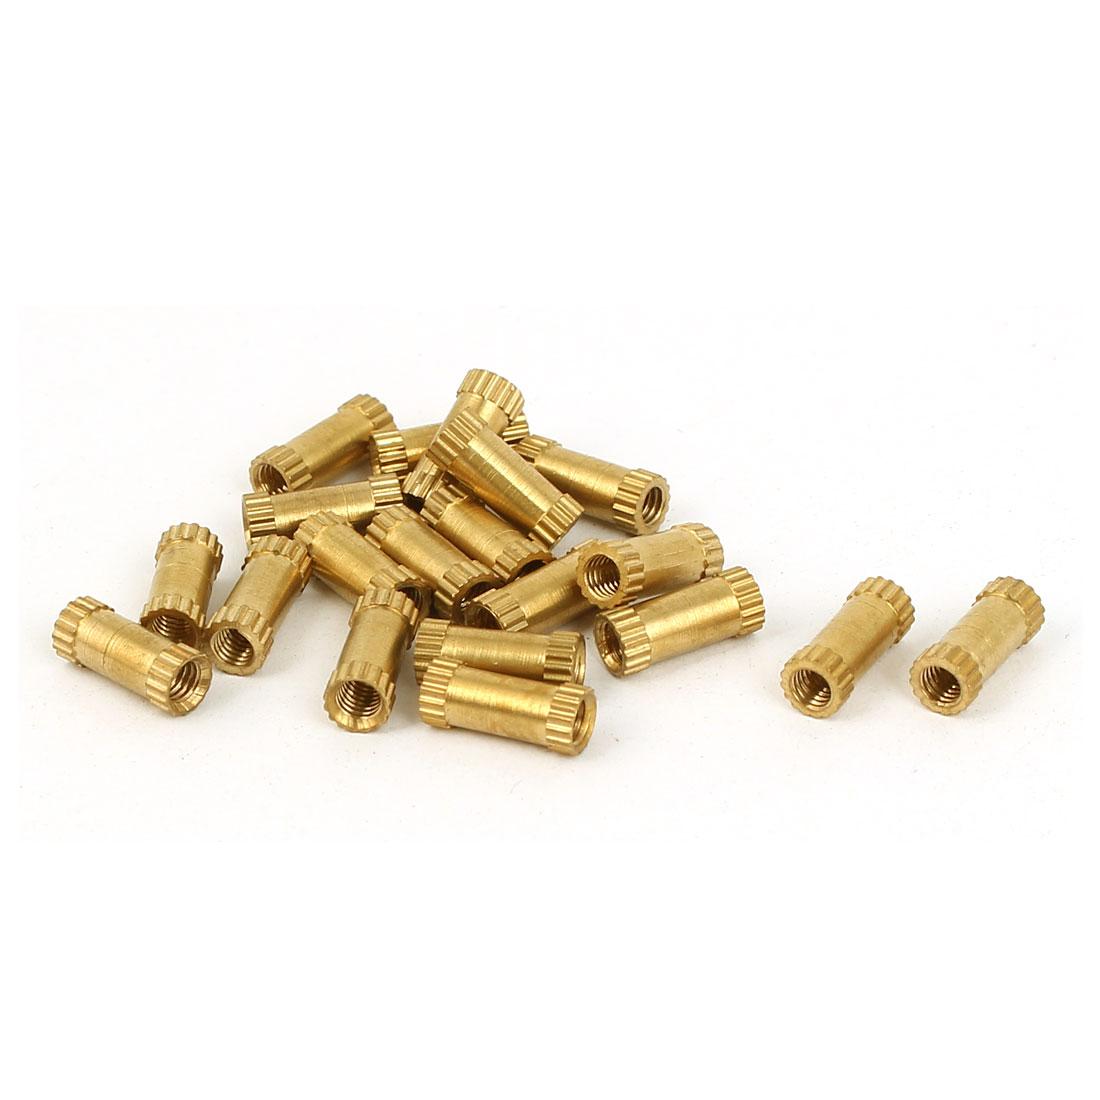 M3 x 4mm x 10mm Female Threaded Insert Embedded Brass Knurled Nuts Hardware 20 Pcs